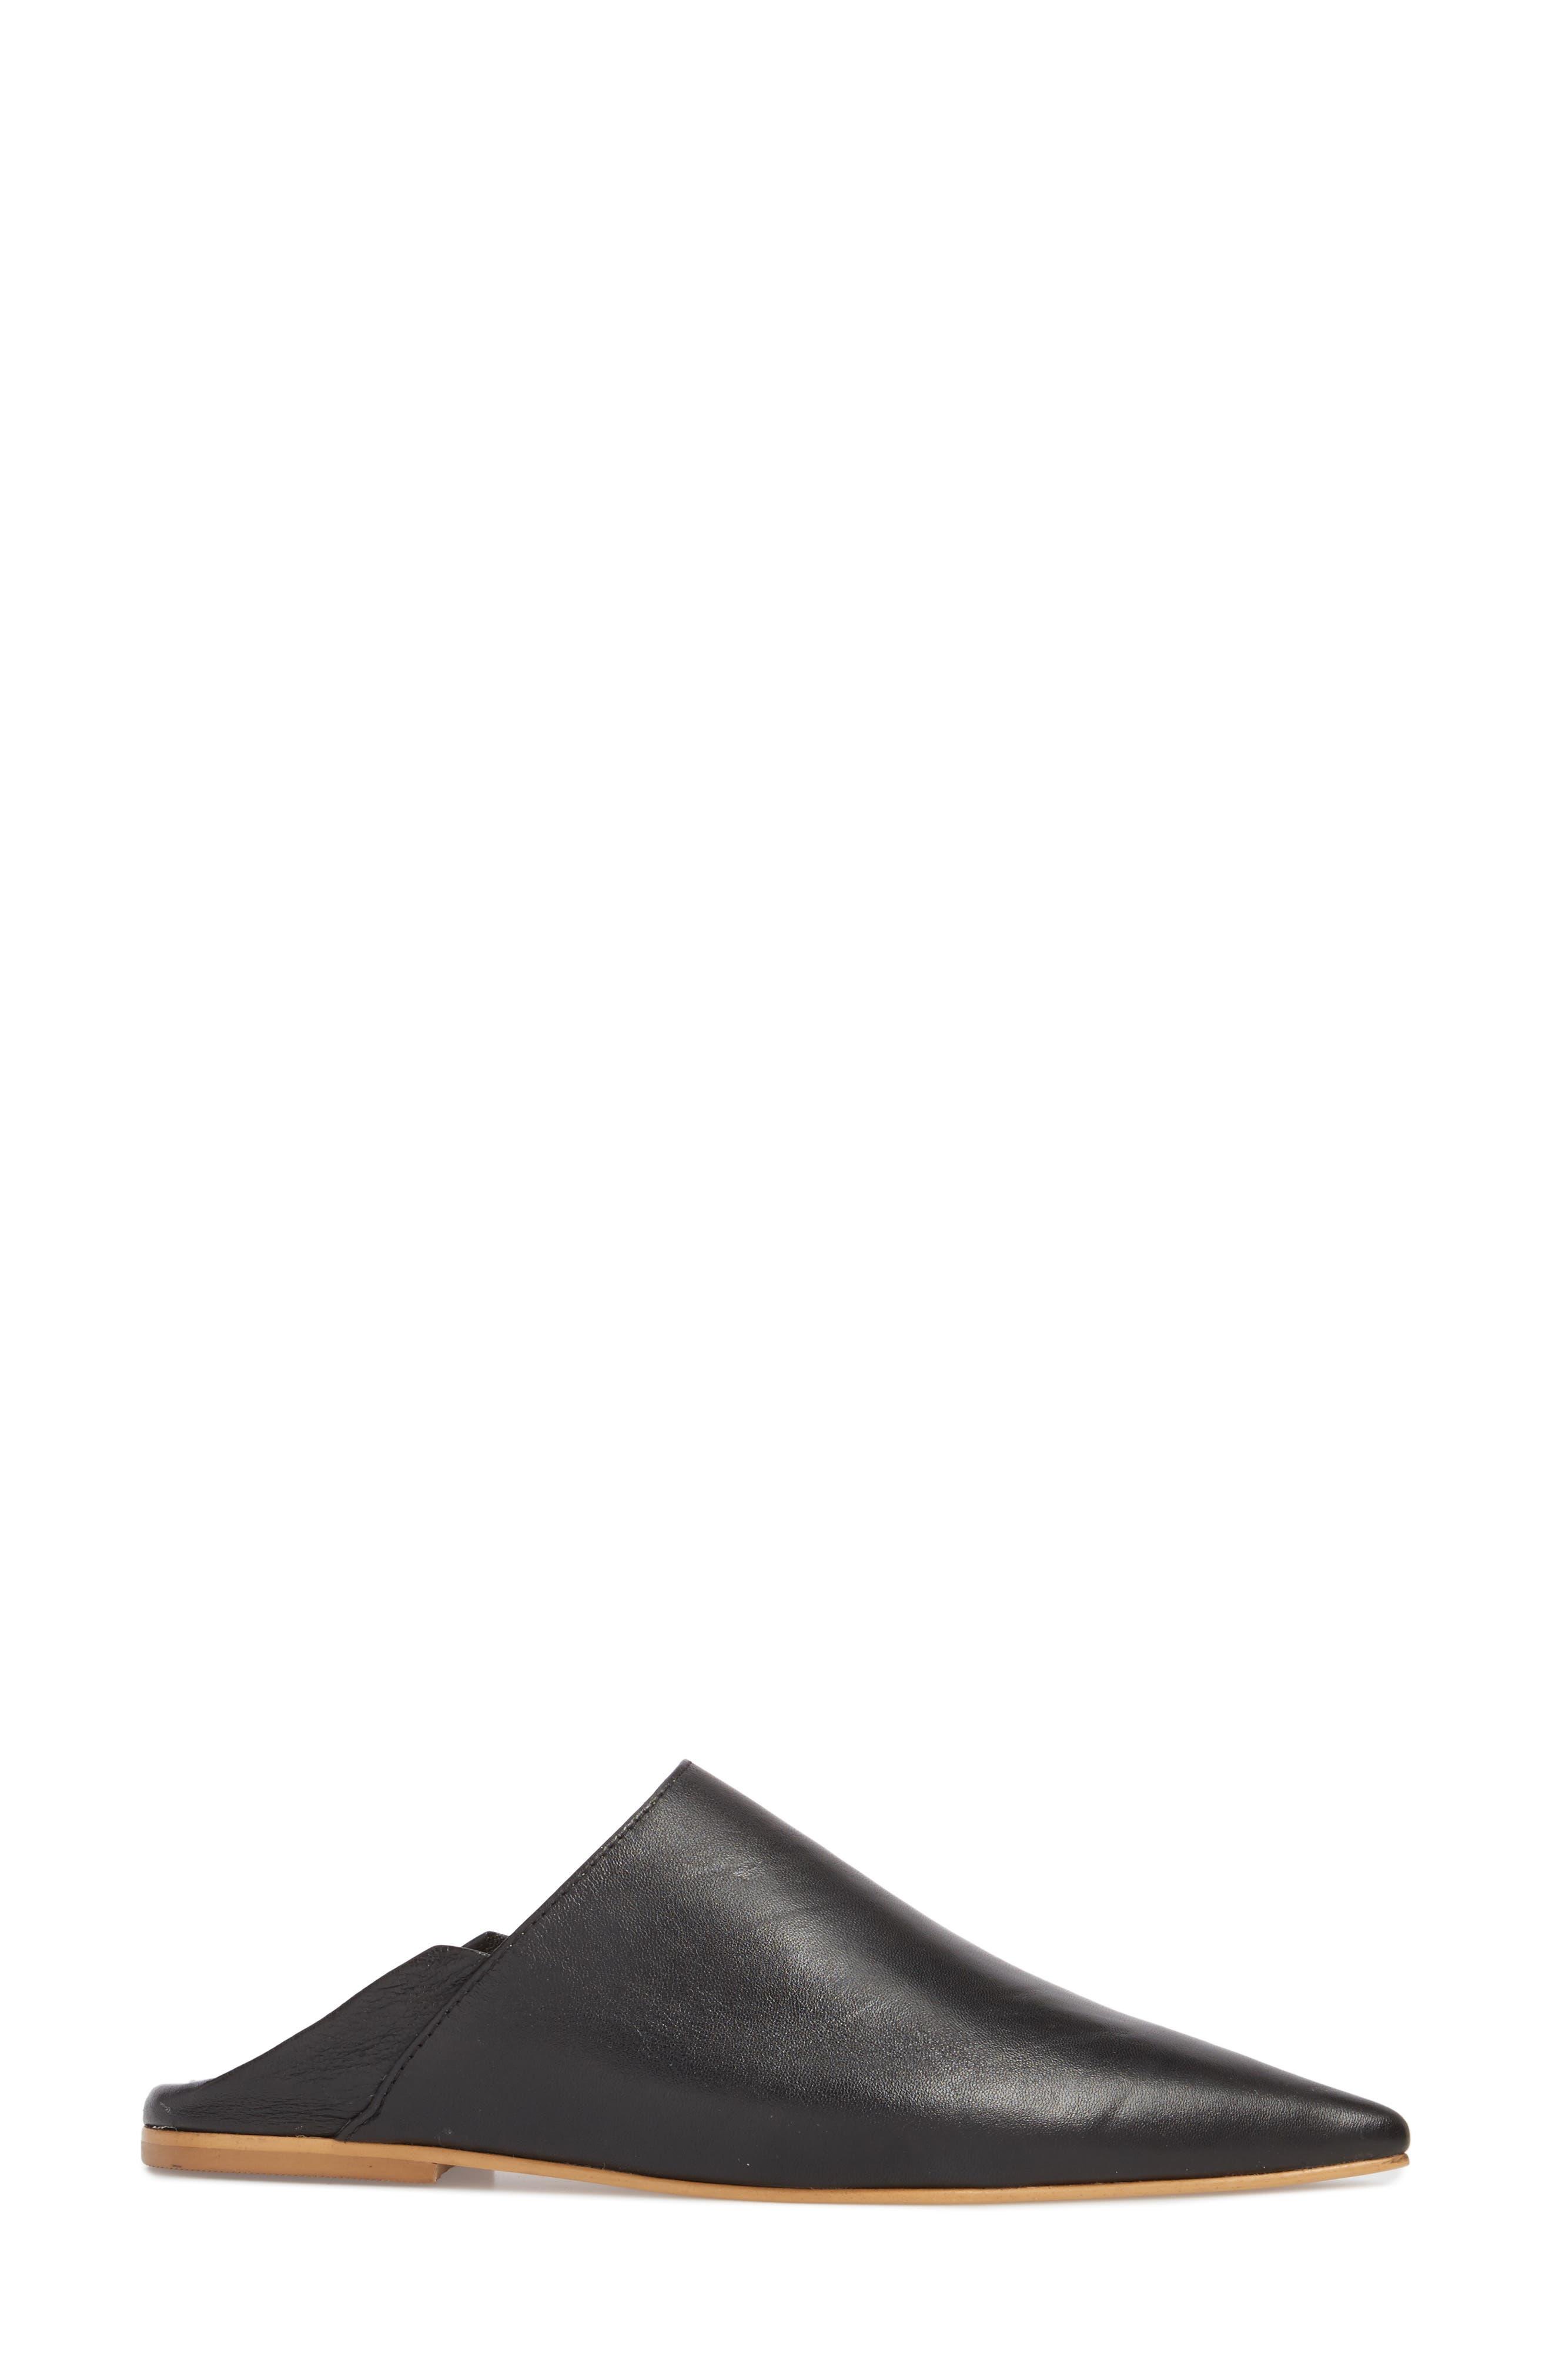 Keeper Mule,                             Alternate thumbnail 3, color,                             Black